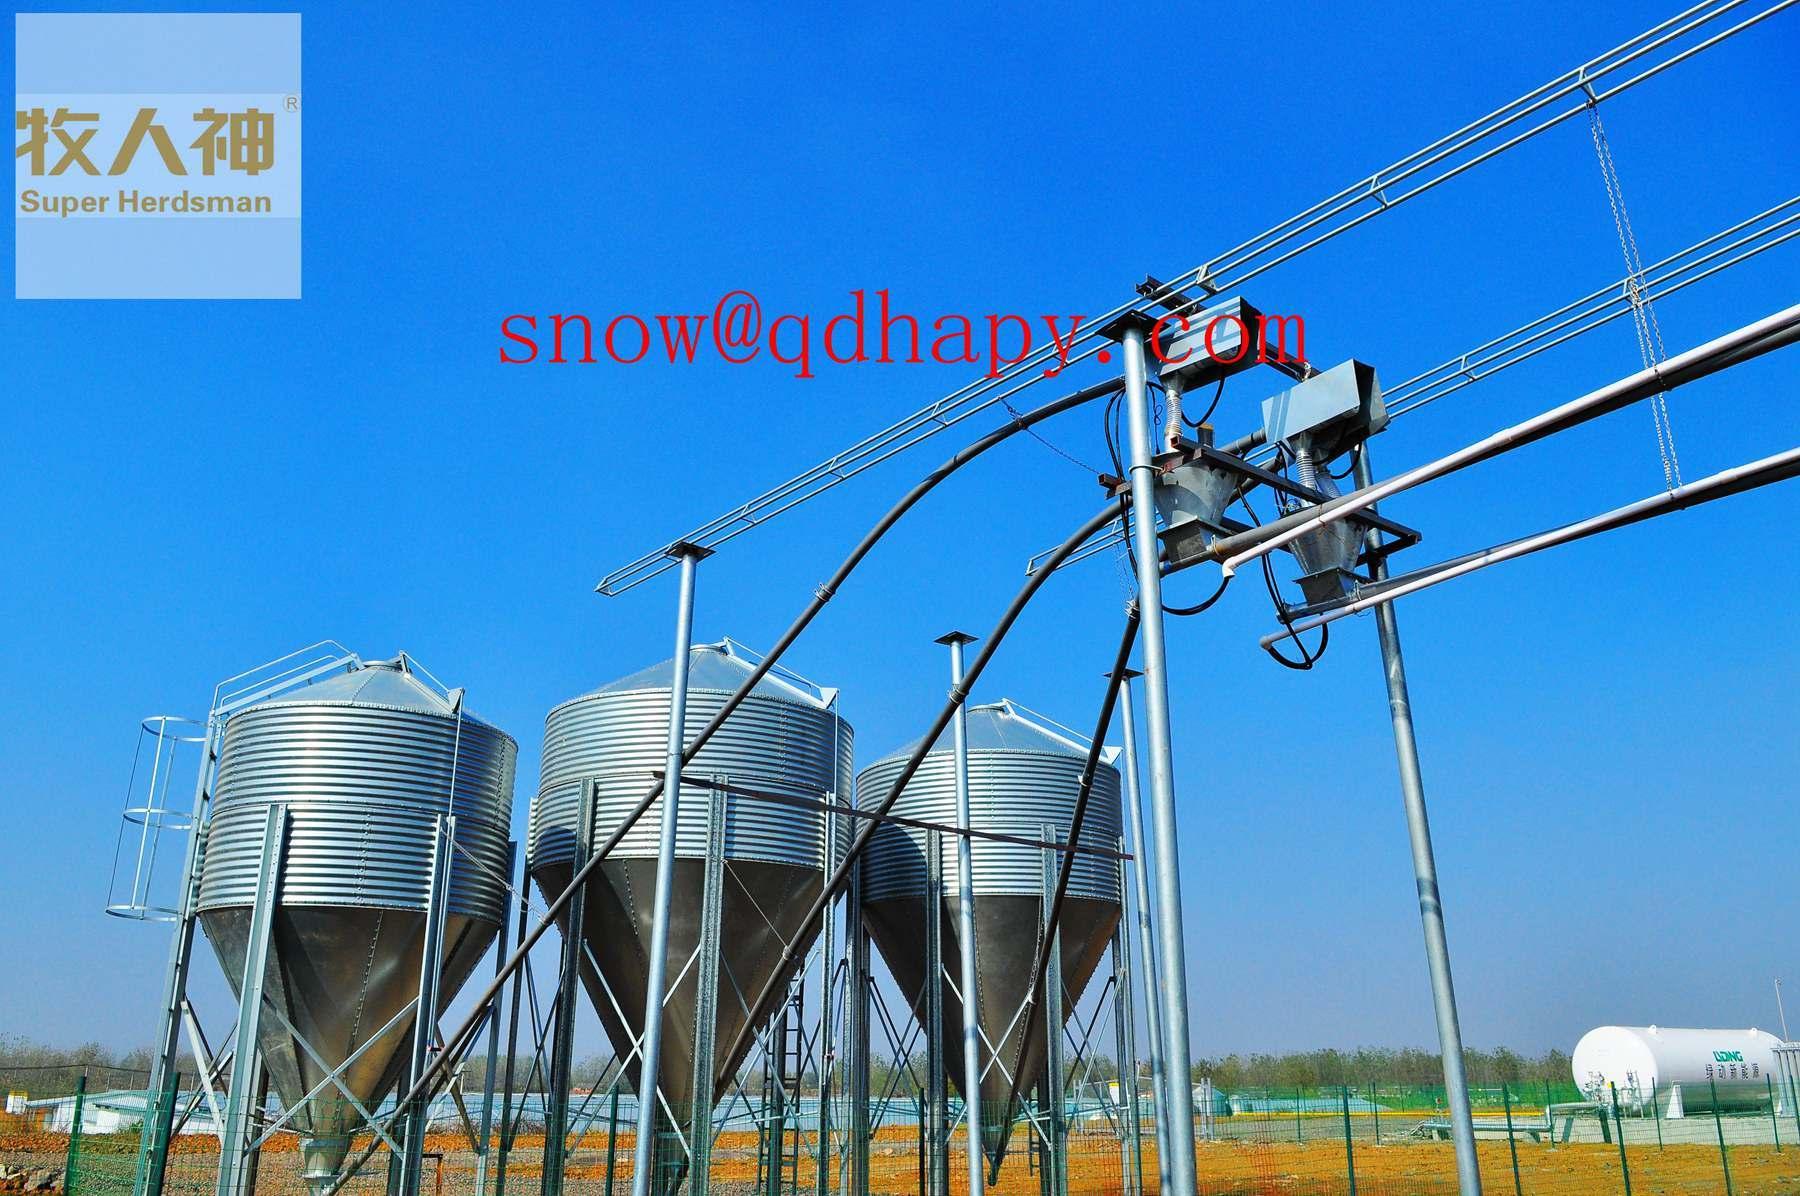 Steel Silo in Breeding System From Super Herdsman